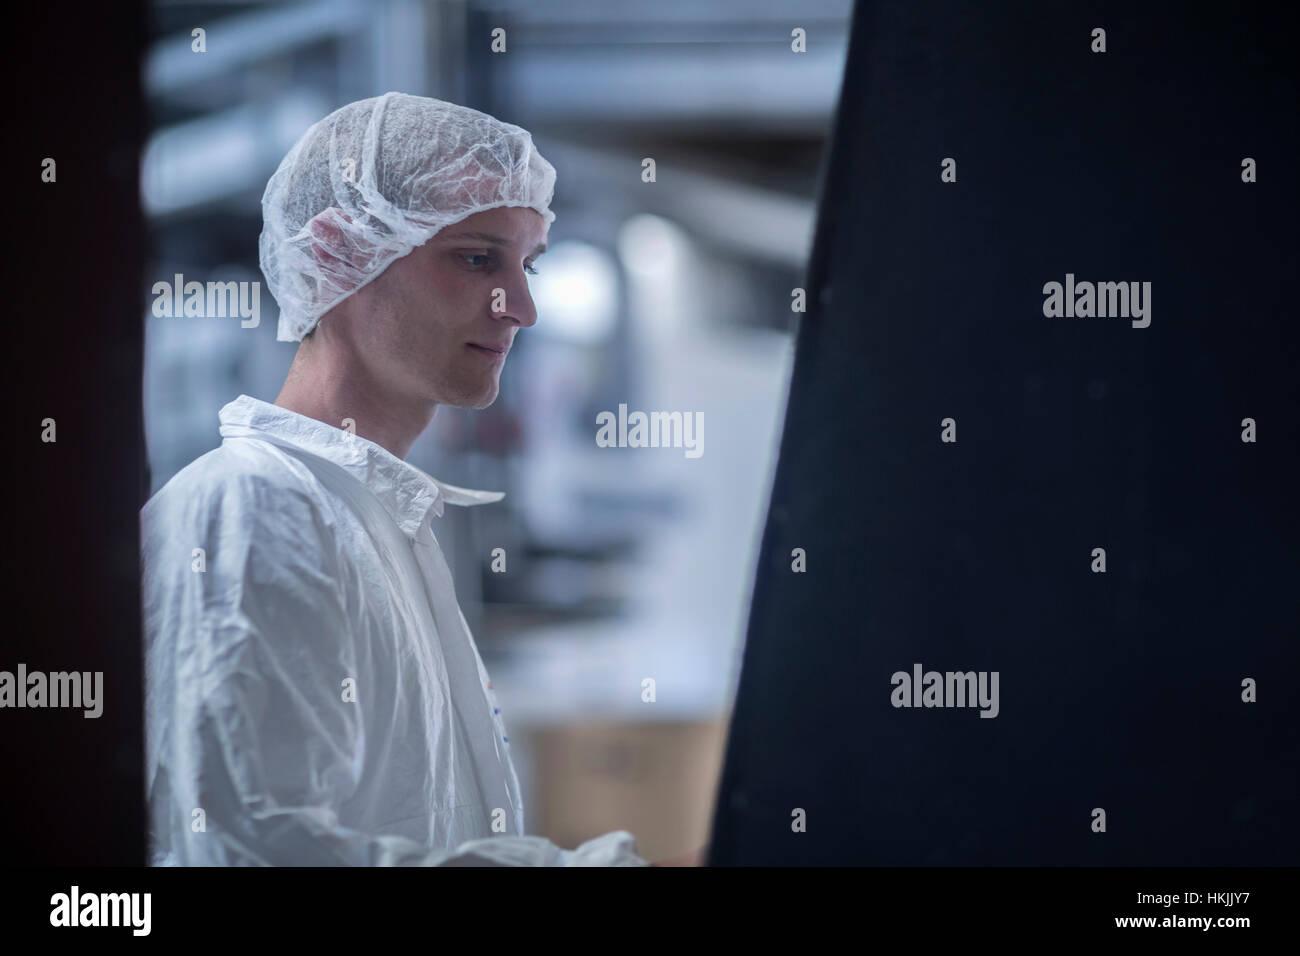 Clean room worker in an industry, Freiburg im Breisgau, Baden-Württemberg, Germany - Stock Image